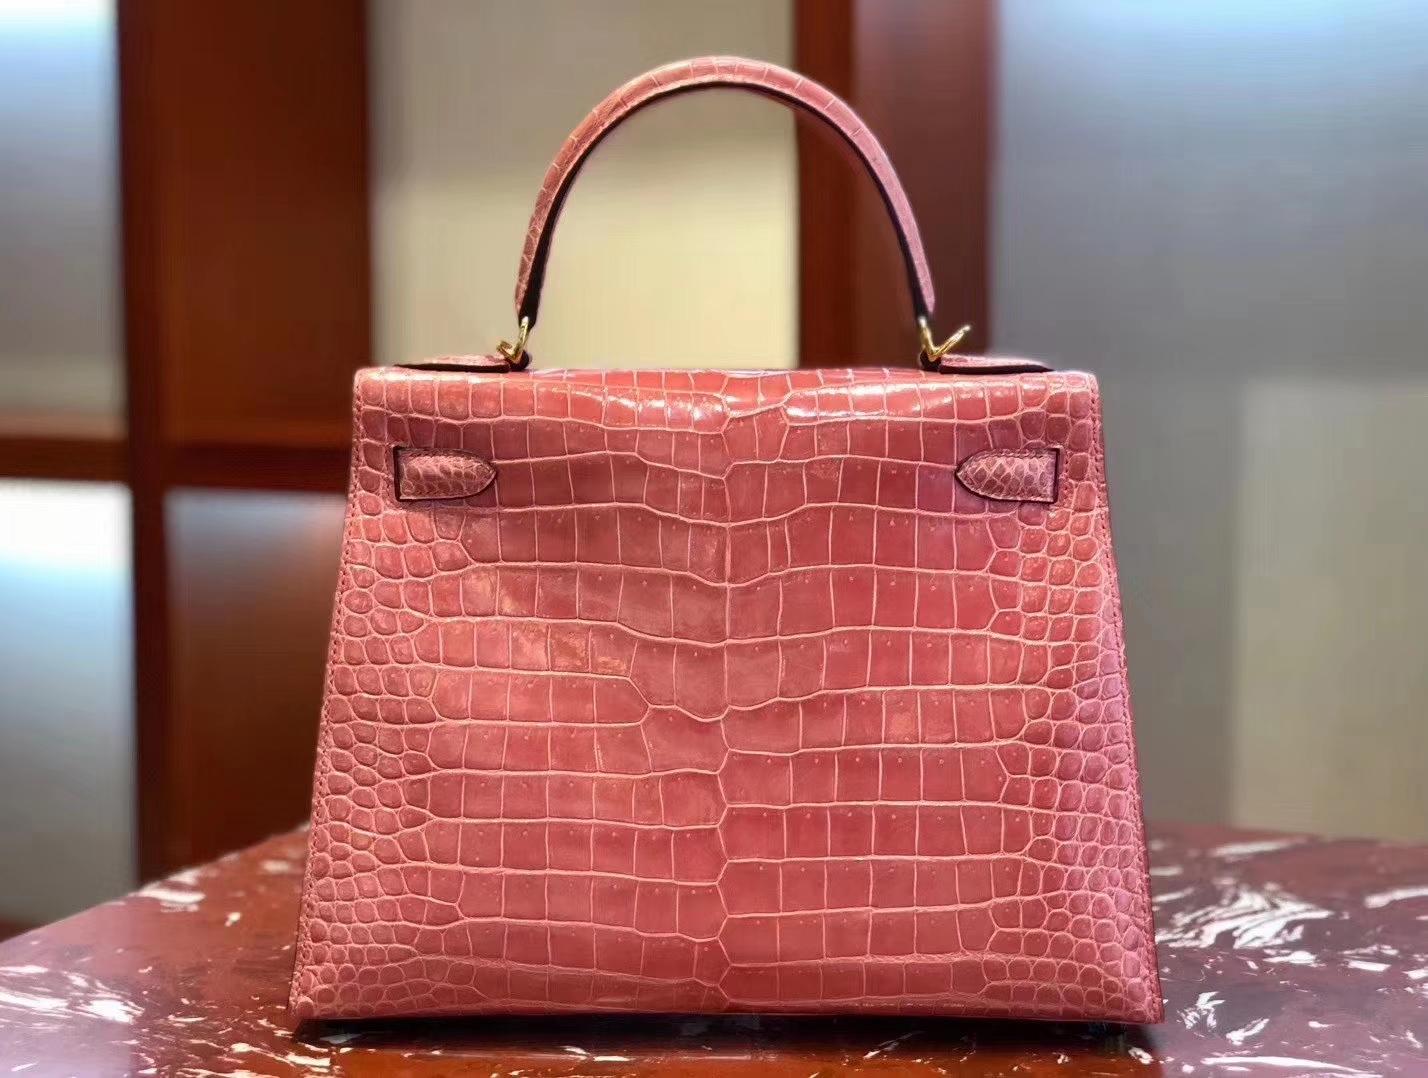 Hermès(爱马仕)Kelly 凯莉包 亮面澳洲湾湾 蜜桃粉 蜡线全手工 金扣 28cm